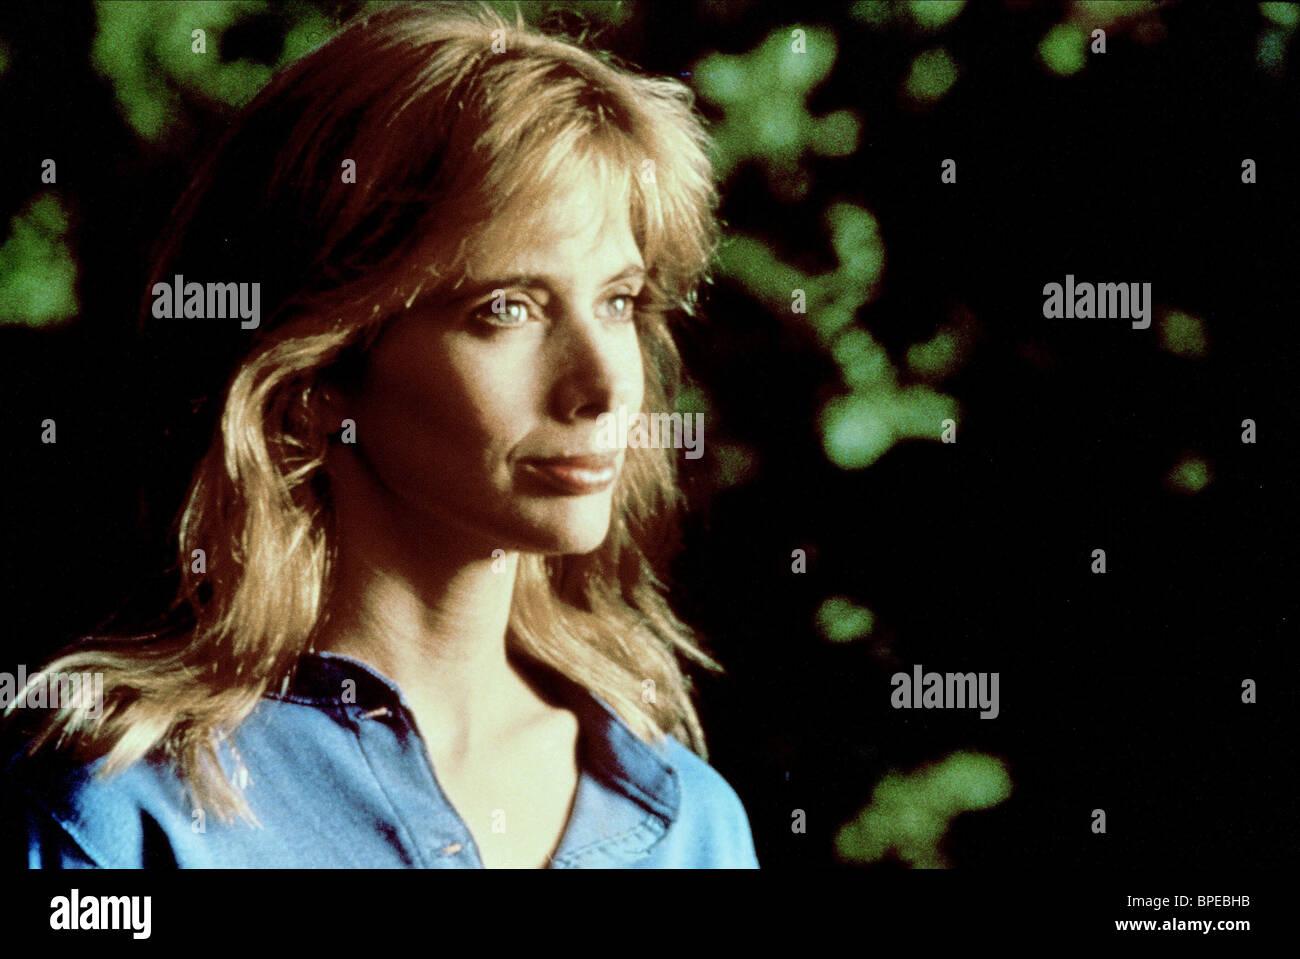 ROSANNA ARQUETTE NOWHERE TO RUN (1993) - Stock Image